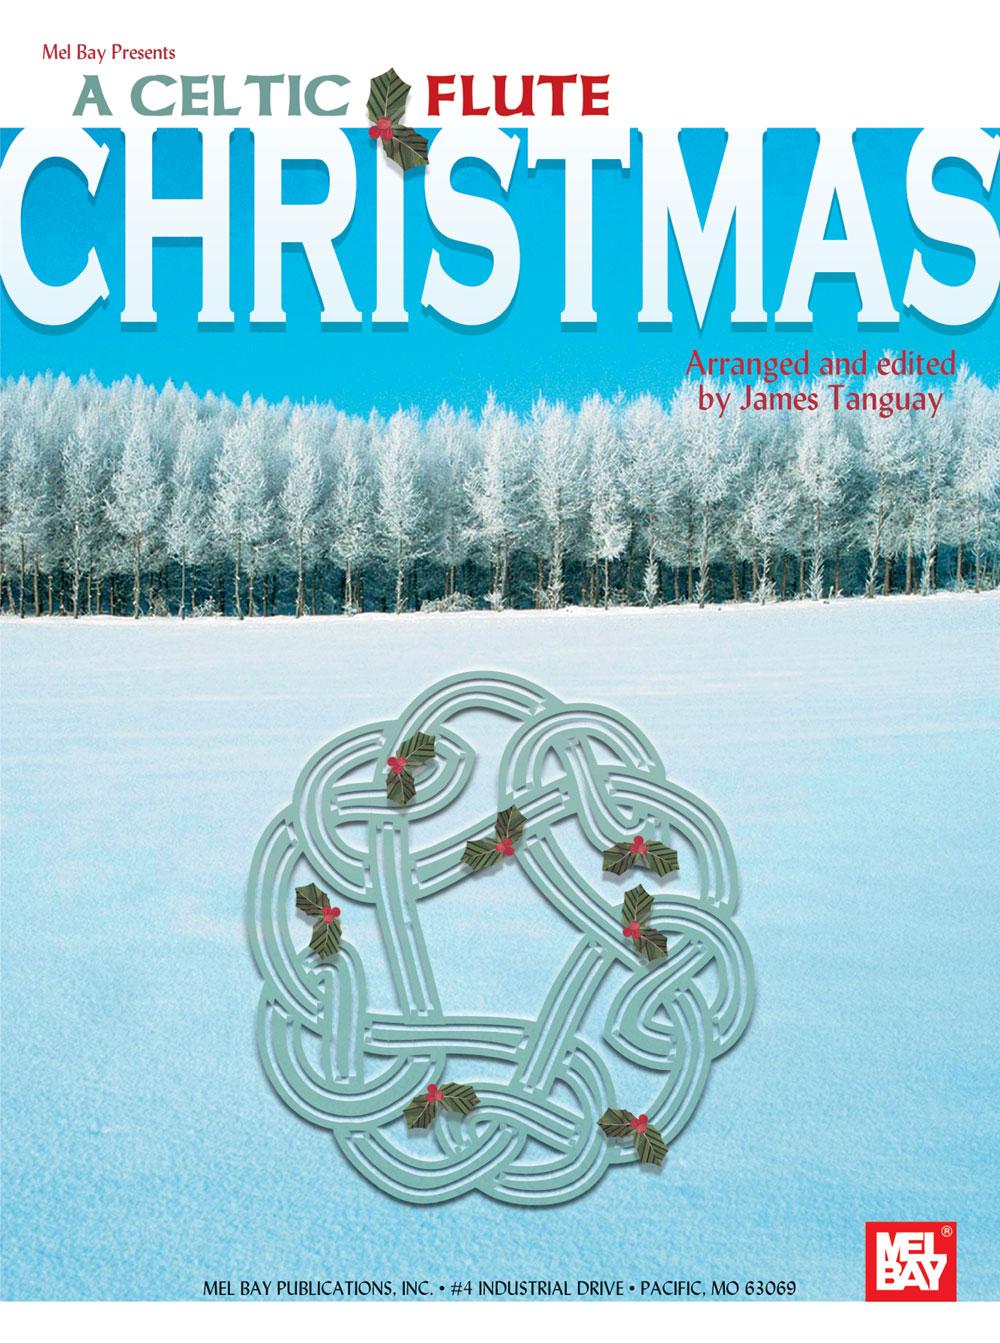 Celtic Flute Christmas